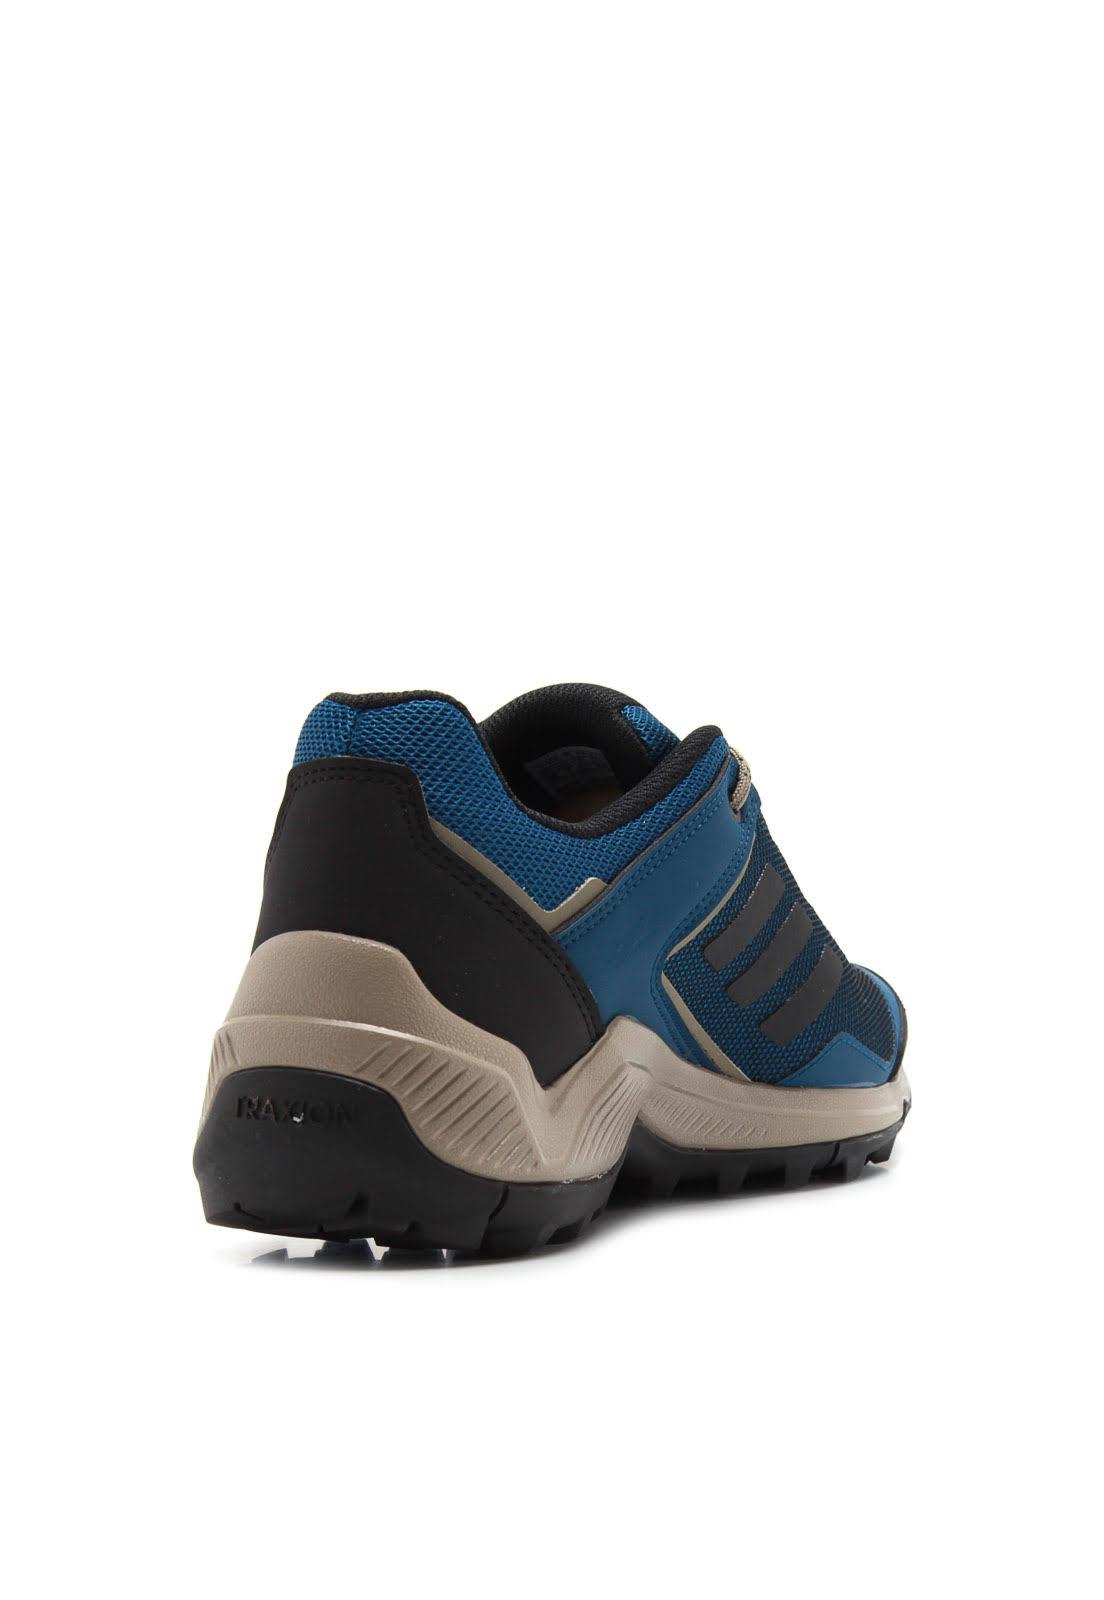 Eastrail Terrex Adidas Man Tennisschoenen Legend MarineBlue Outdoor wOPkN08nX